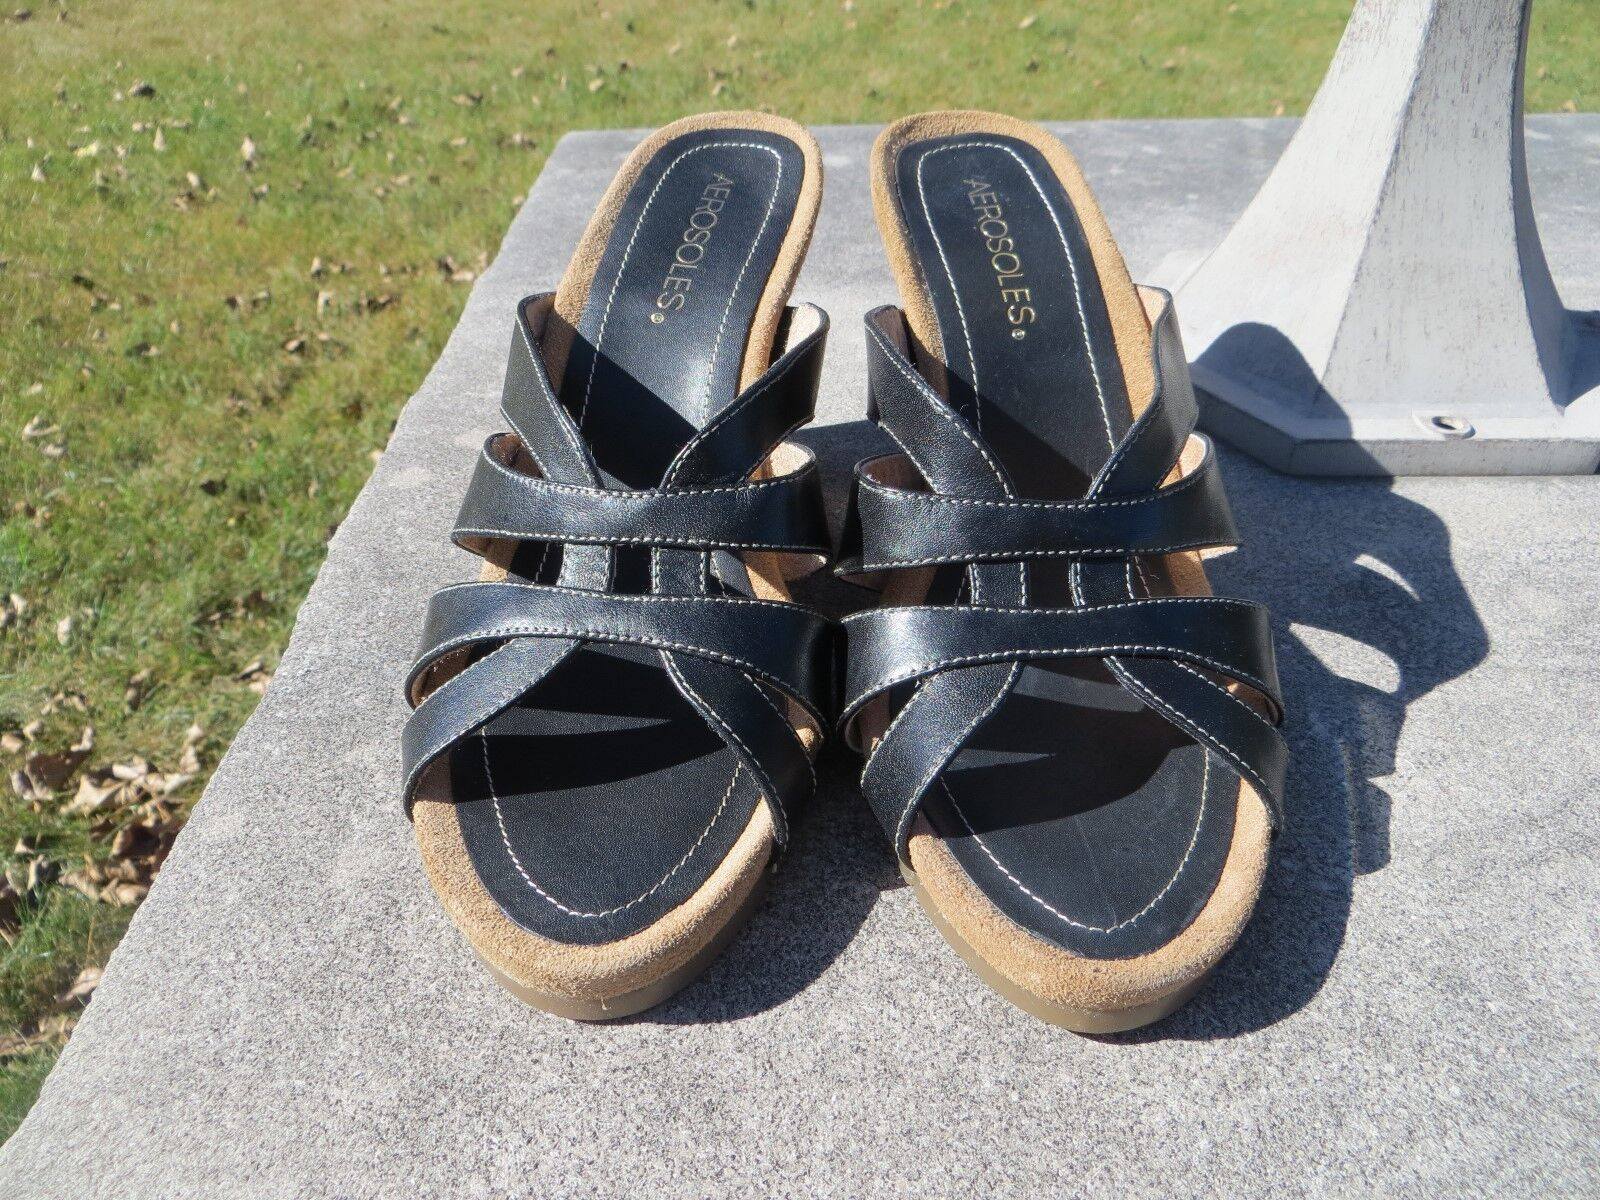 Boho-Chic Mules / Flats, Slip-on, Sparkle Sequined Beaded Slide-on Black Sz 10